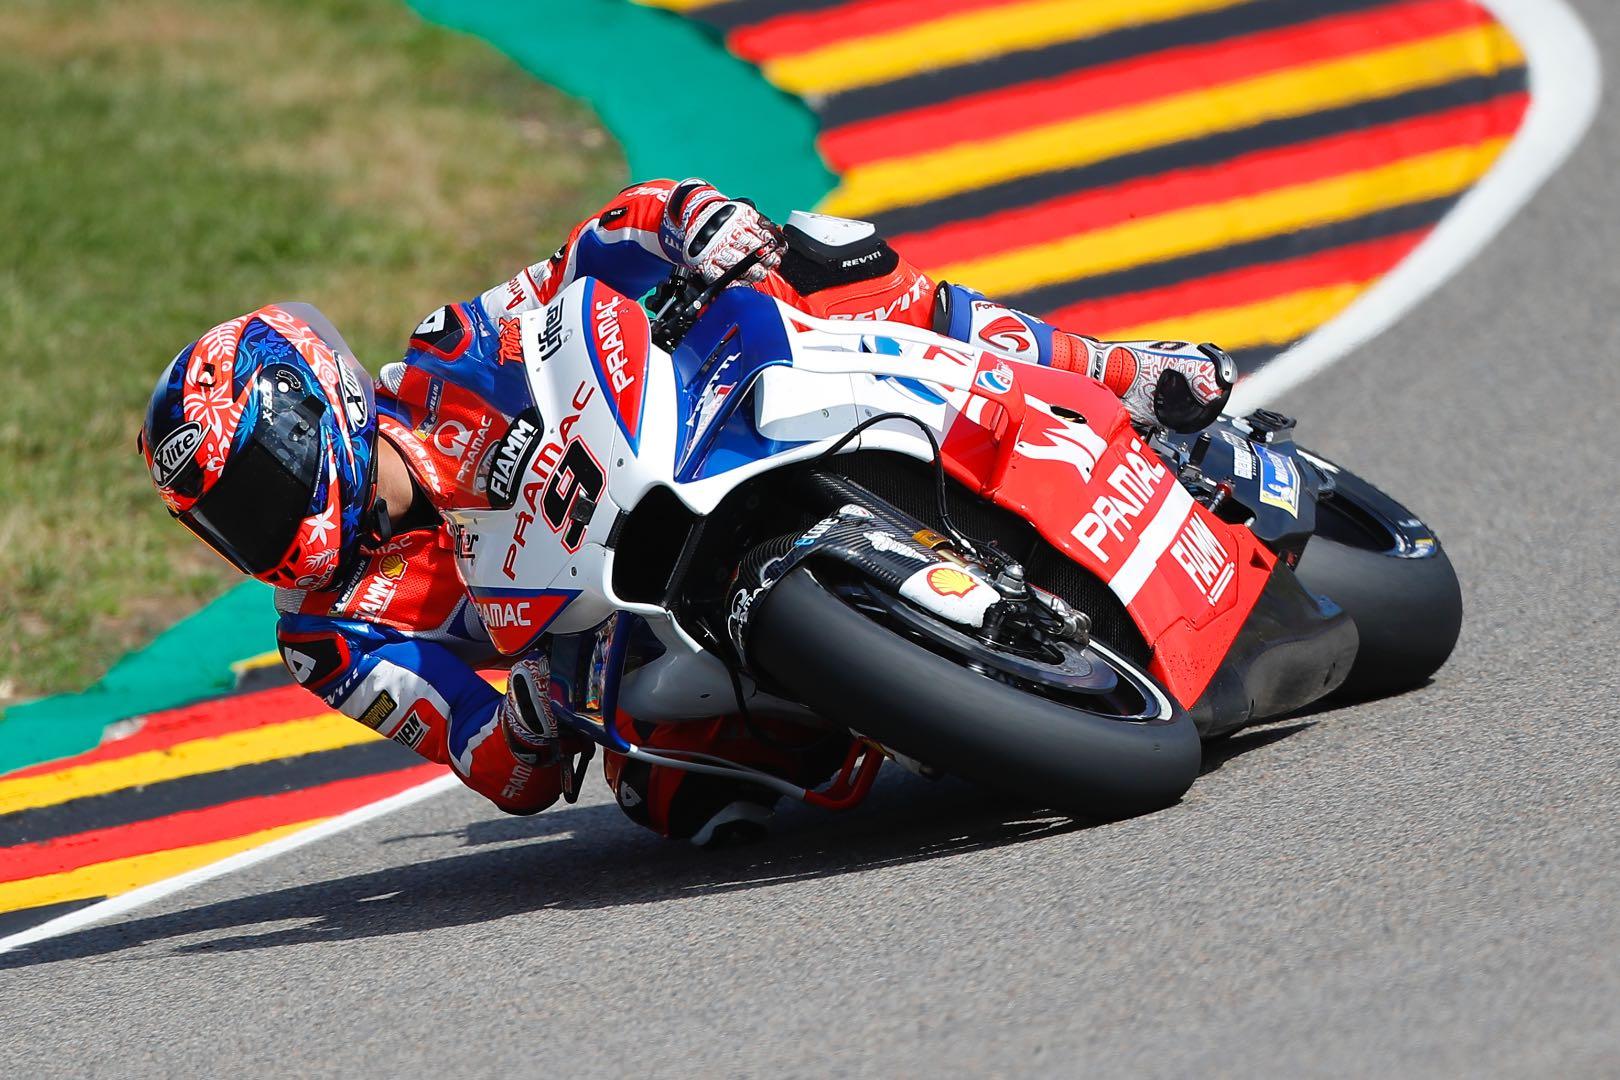 2018 Sachsenring MotoGP Qualifying: Ducati Danilo Petrucci